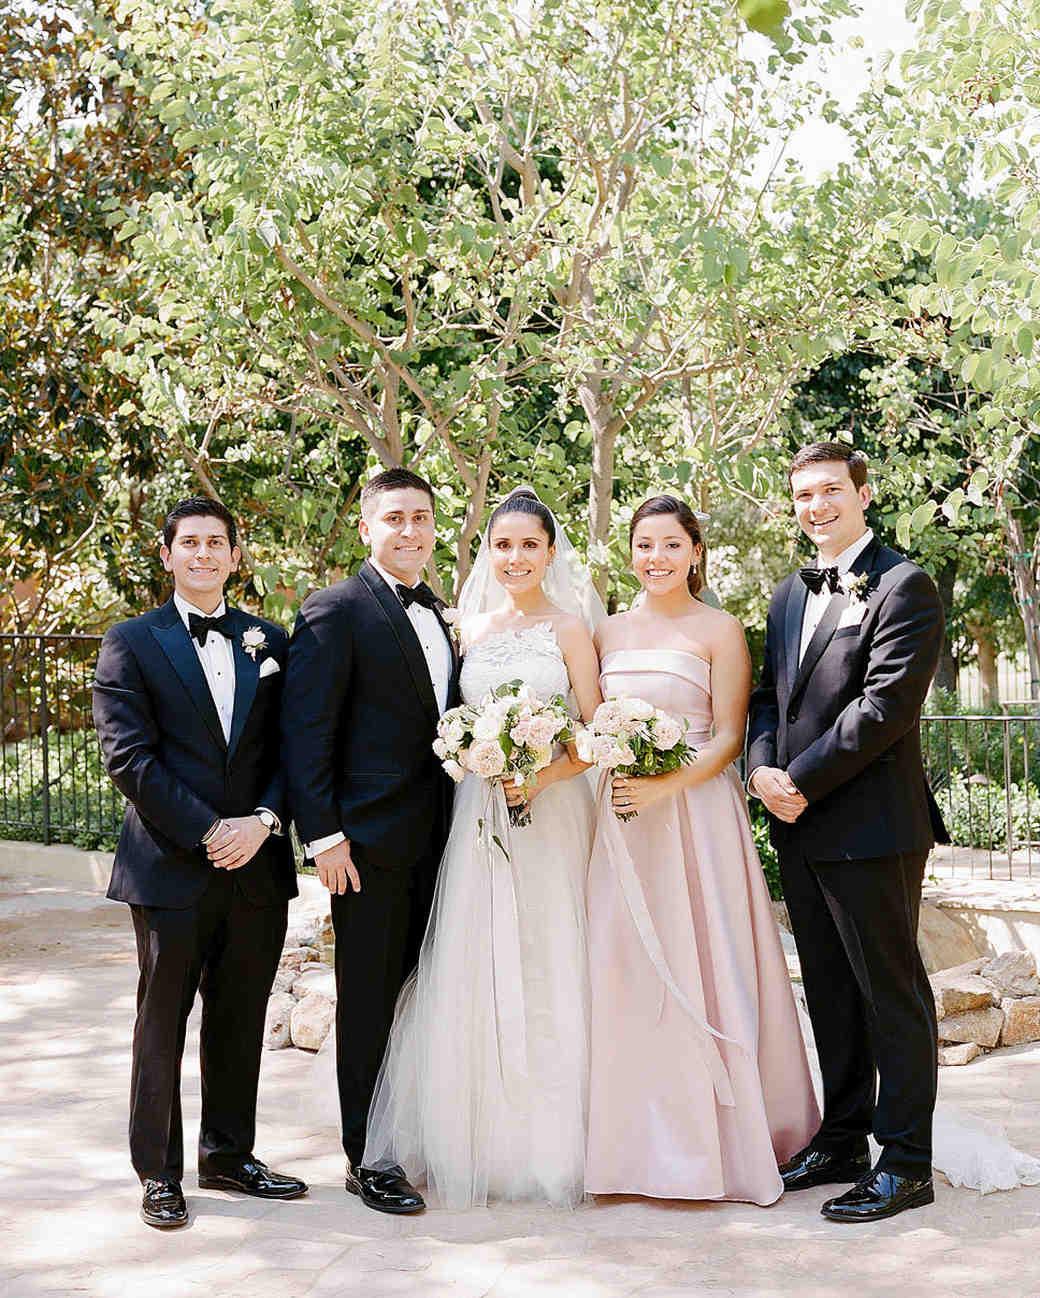 aislinn eric wedding malibu bridesmaid groomsmen